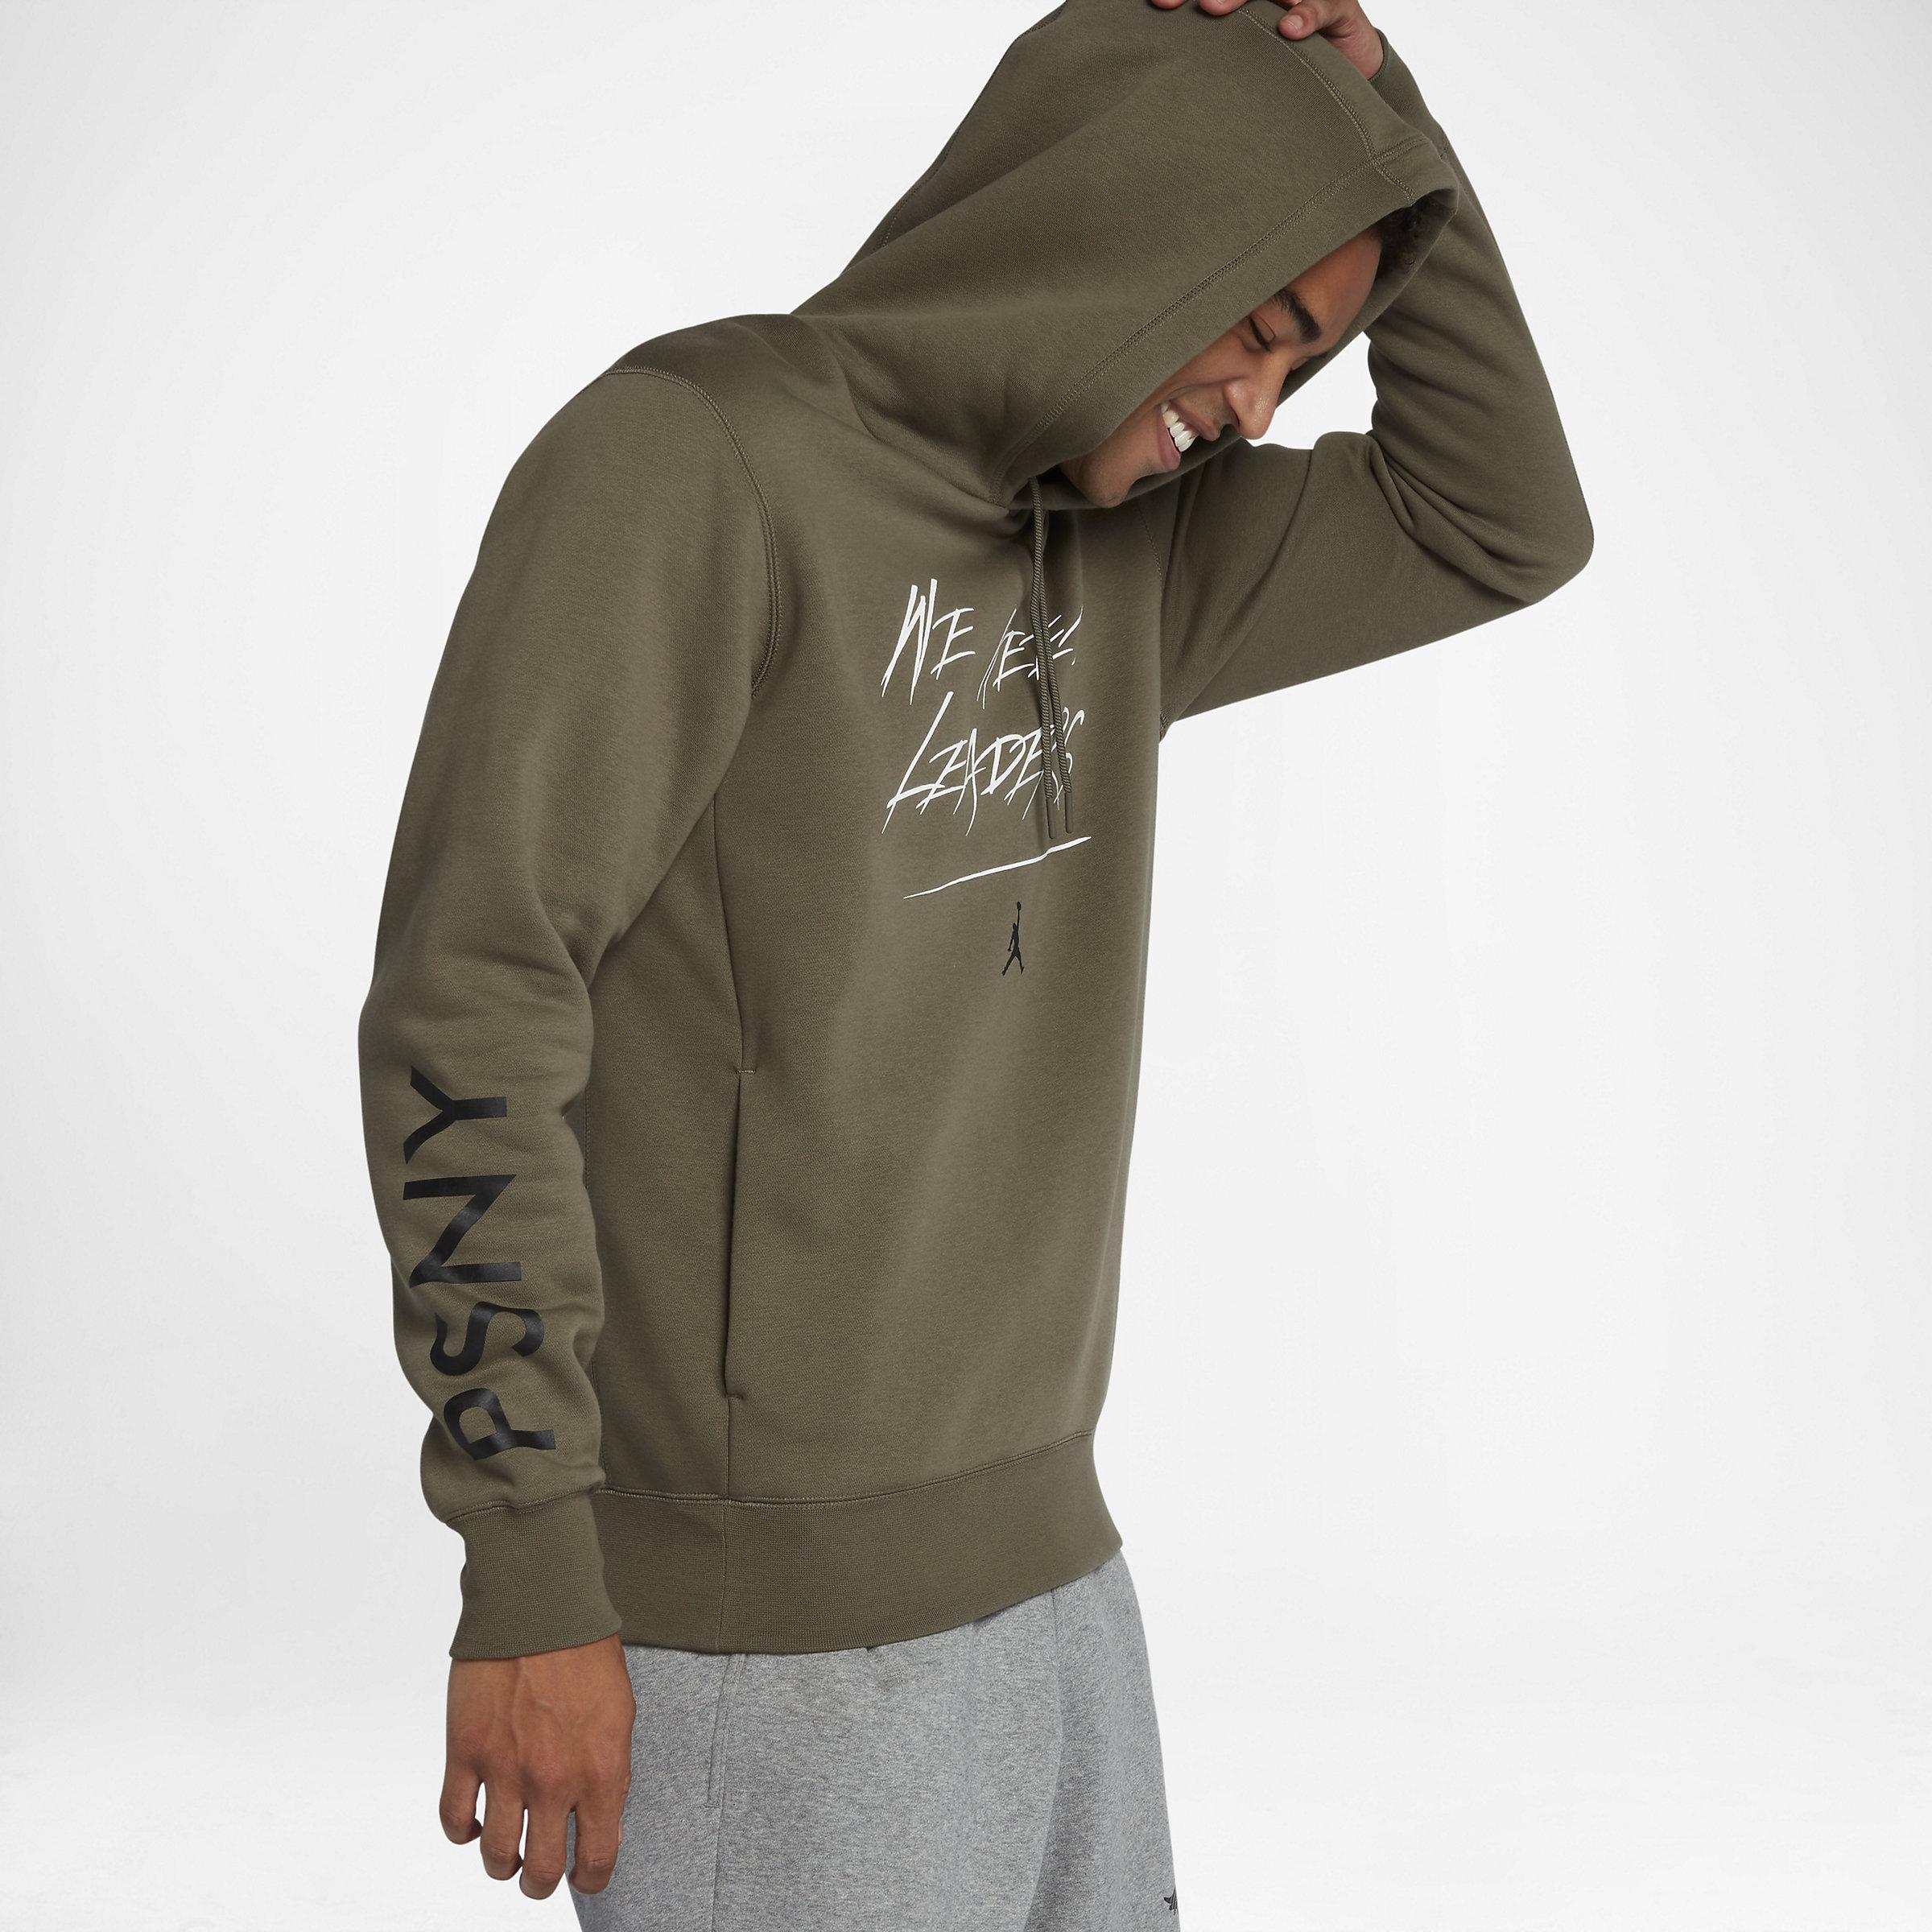 eb84460ebc6862 Nike Jordan X Psny Fleece in Green for Men - Lyst